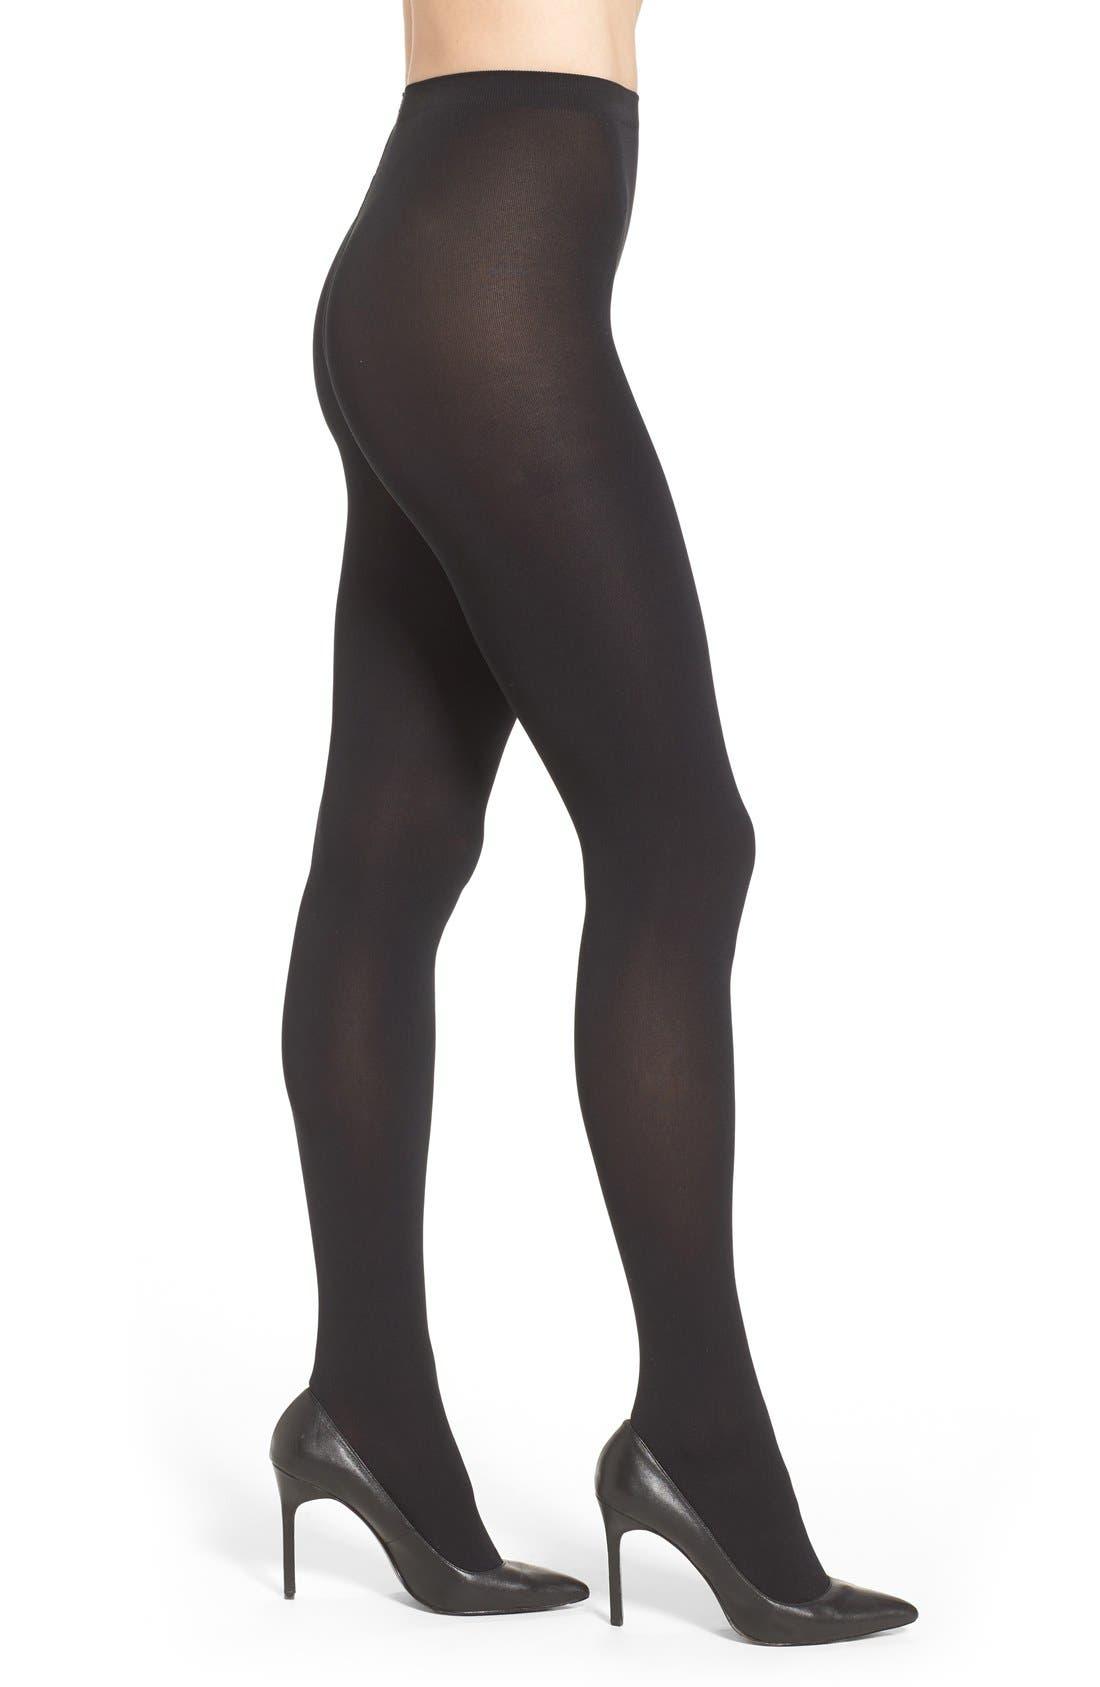 Matte Opaque Tights,                         Main,                         color, Black